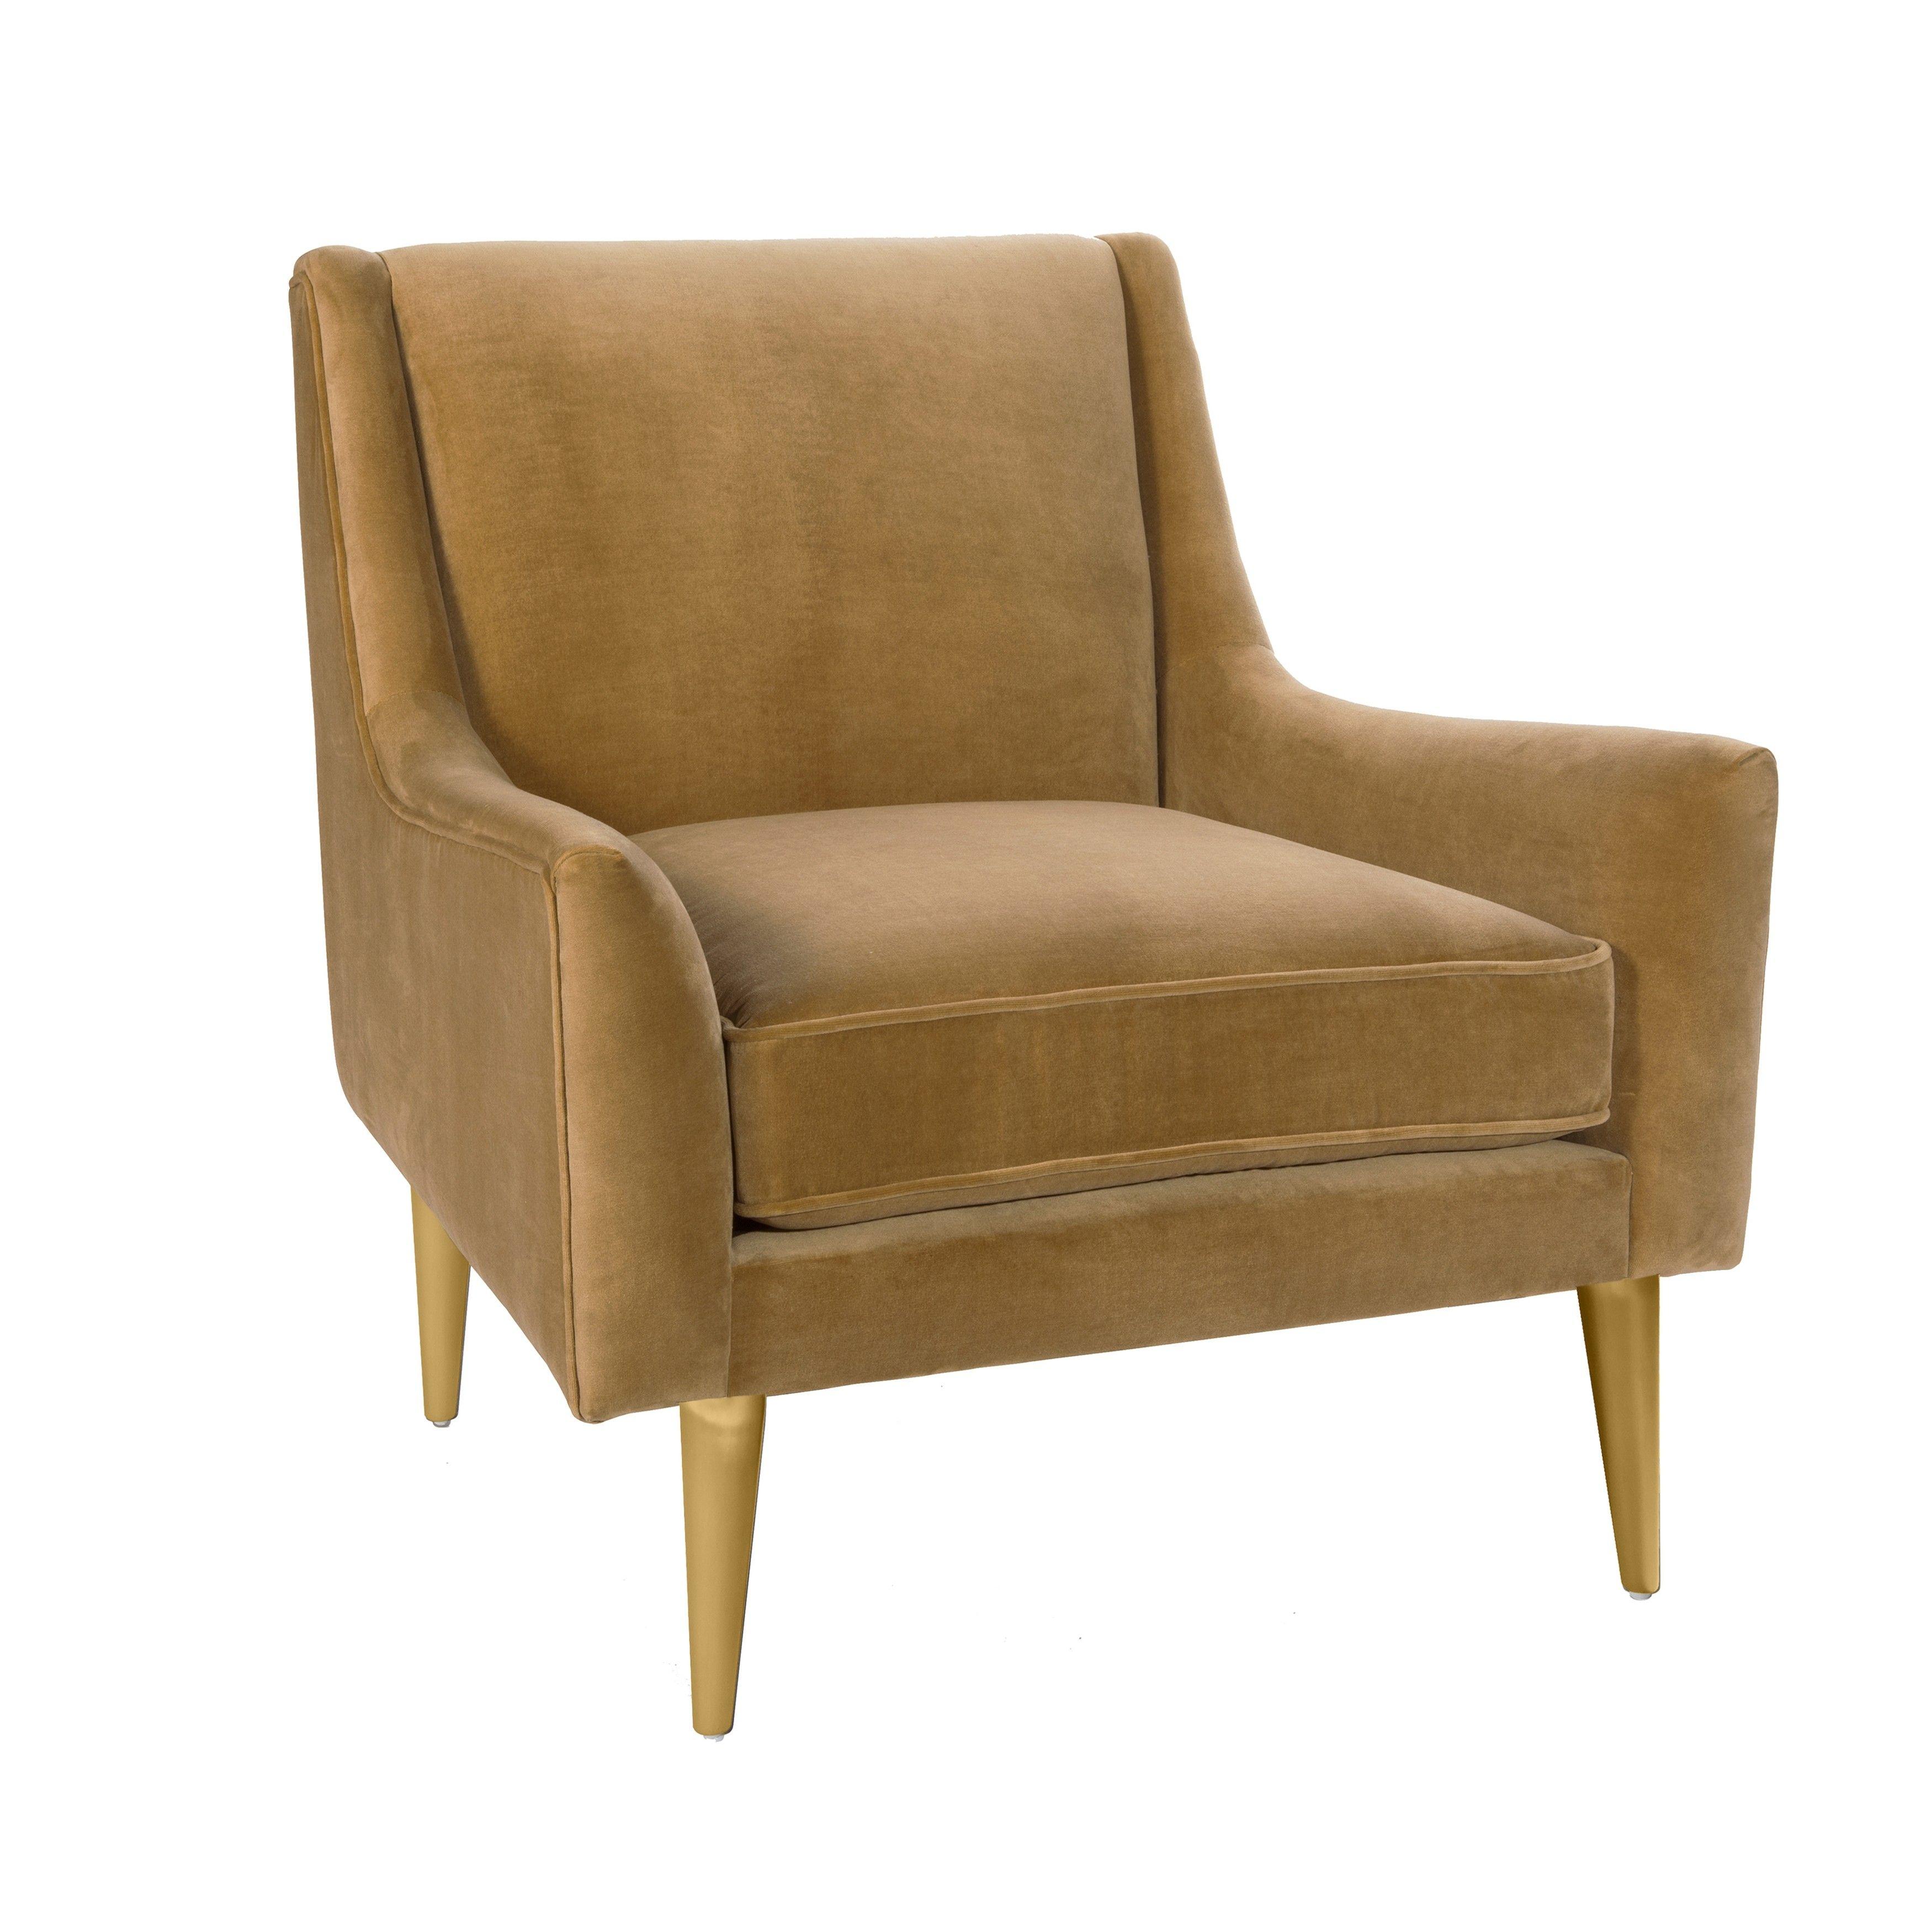 Marvelous Image Result For Camel Velvet Chair Living Room White Pabps2019 Chair Design Images Pabps2019Com